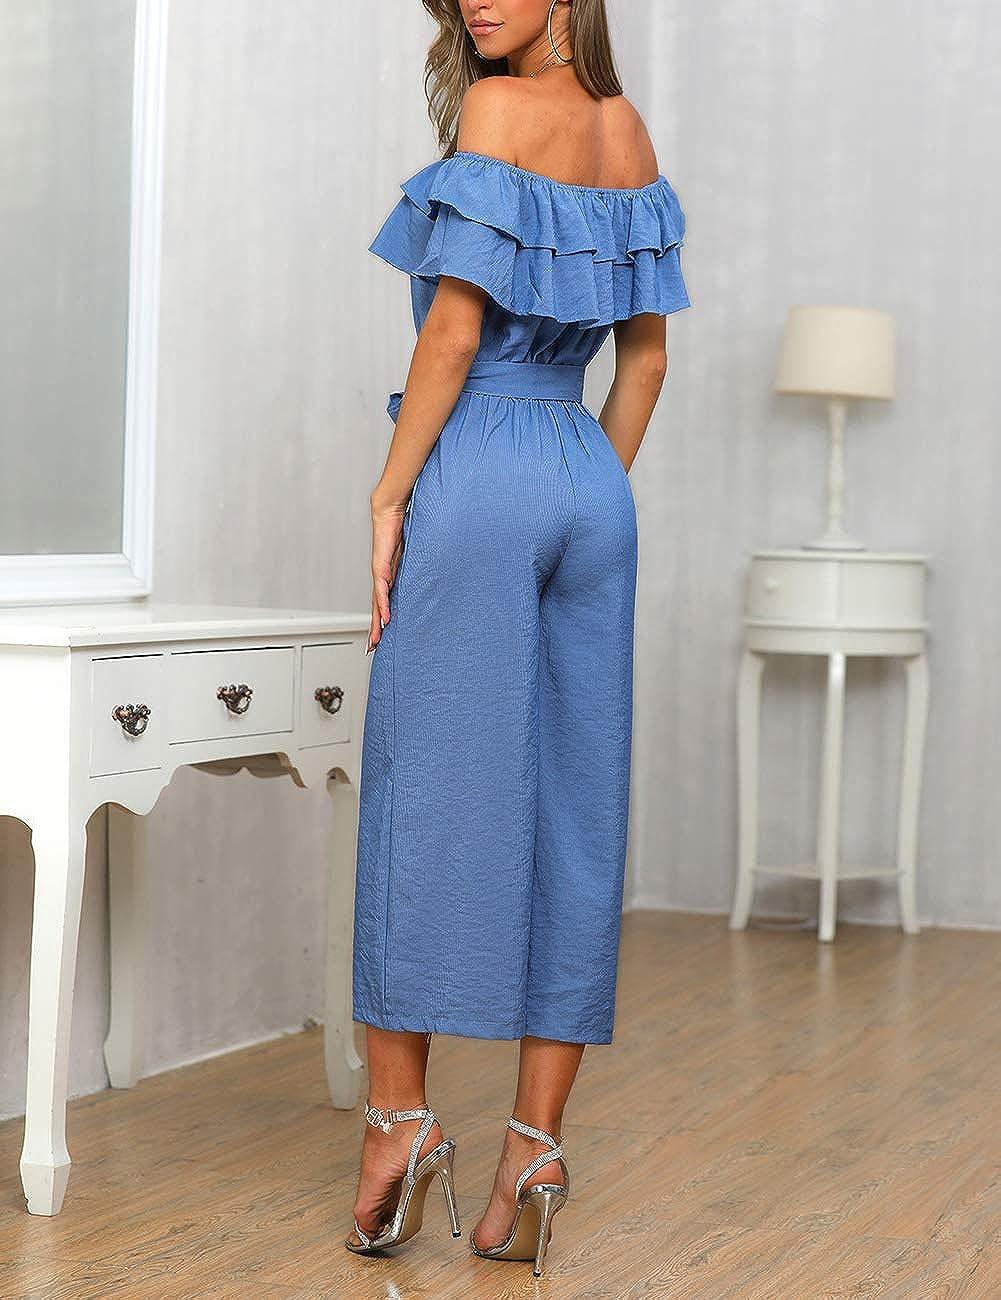 MISOMEE Women Summer Off Shoulder Ruffles Wide Leg Jumpsuit L Blue